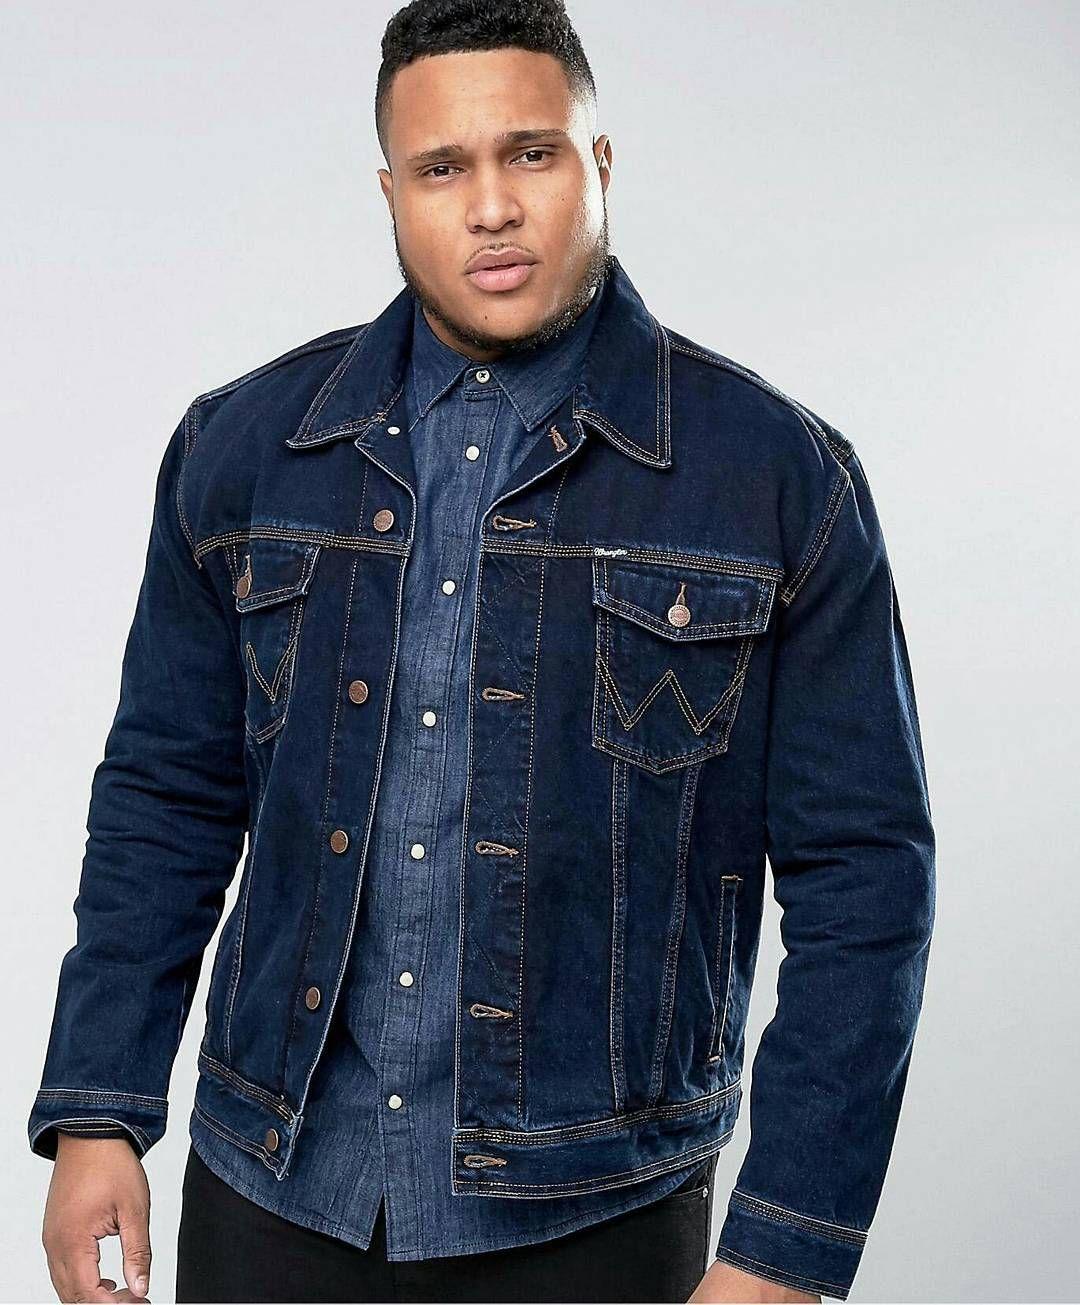 085bdc8f3fa Fashion tips Plus Size Men - Conseil Mode Homme grande taille -  chubster   barnab  Tshirt  polo  shirt  chemise  blazer  jacket  veste  débardeur   tank ...